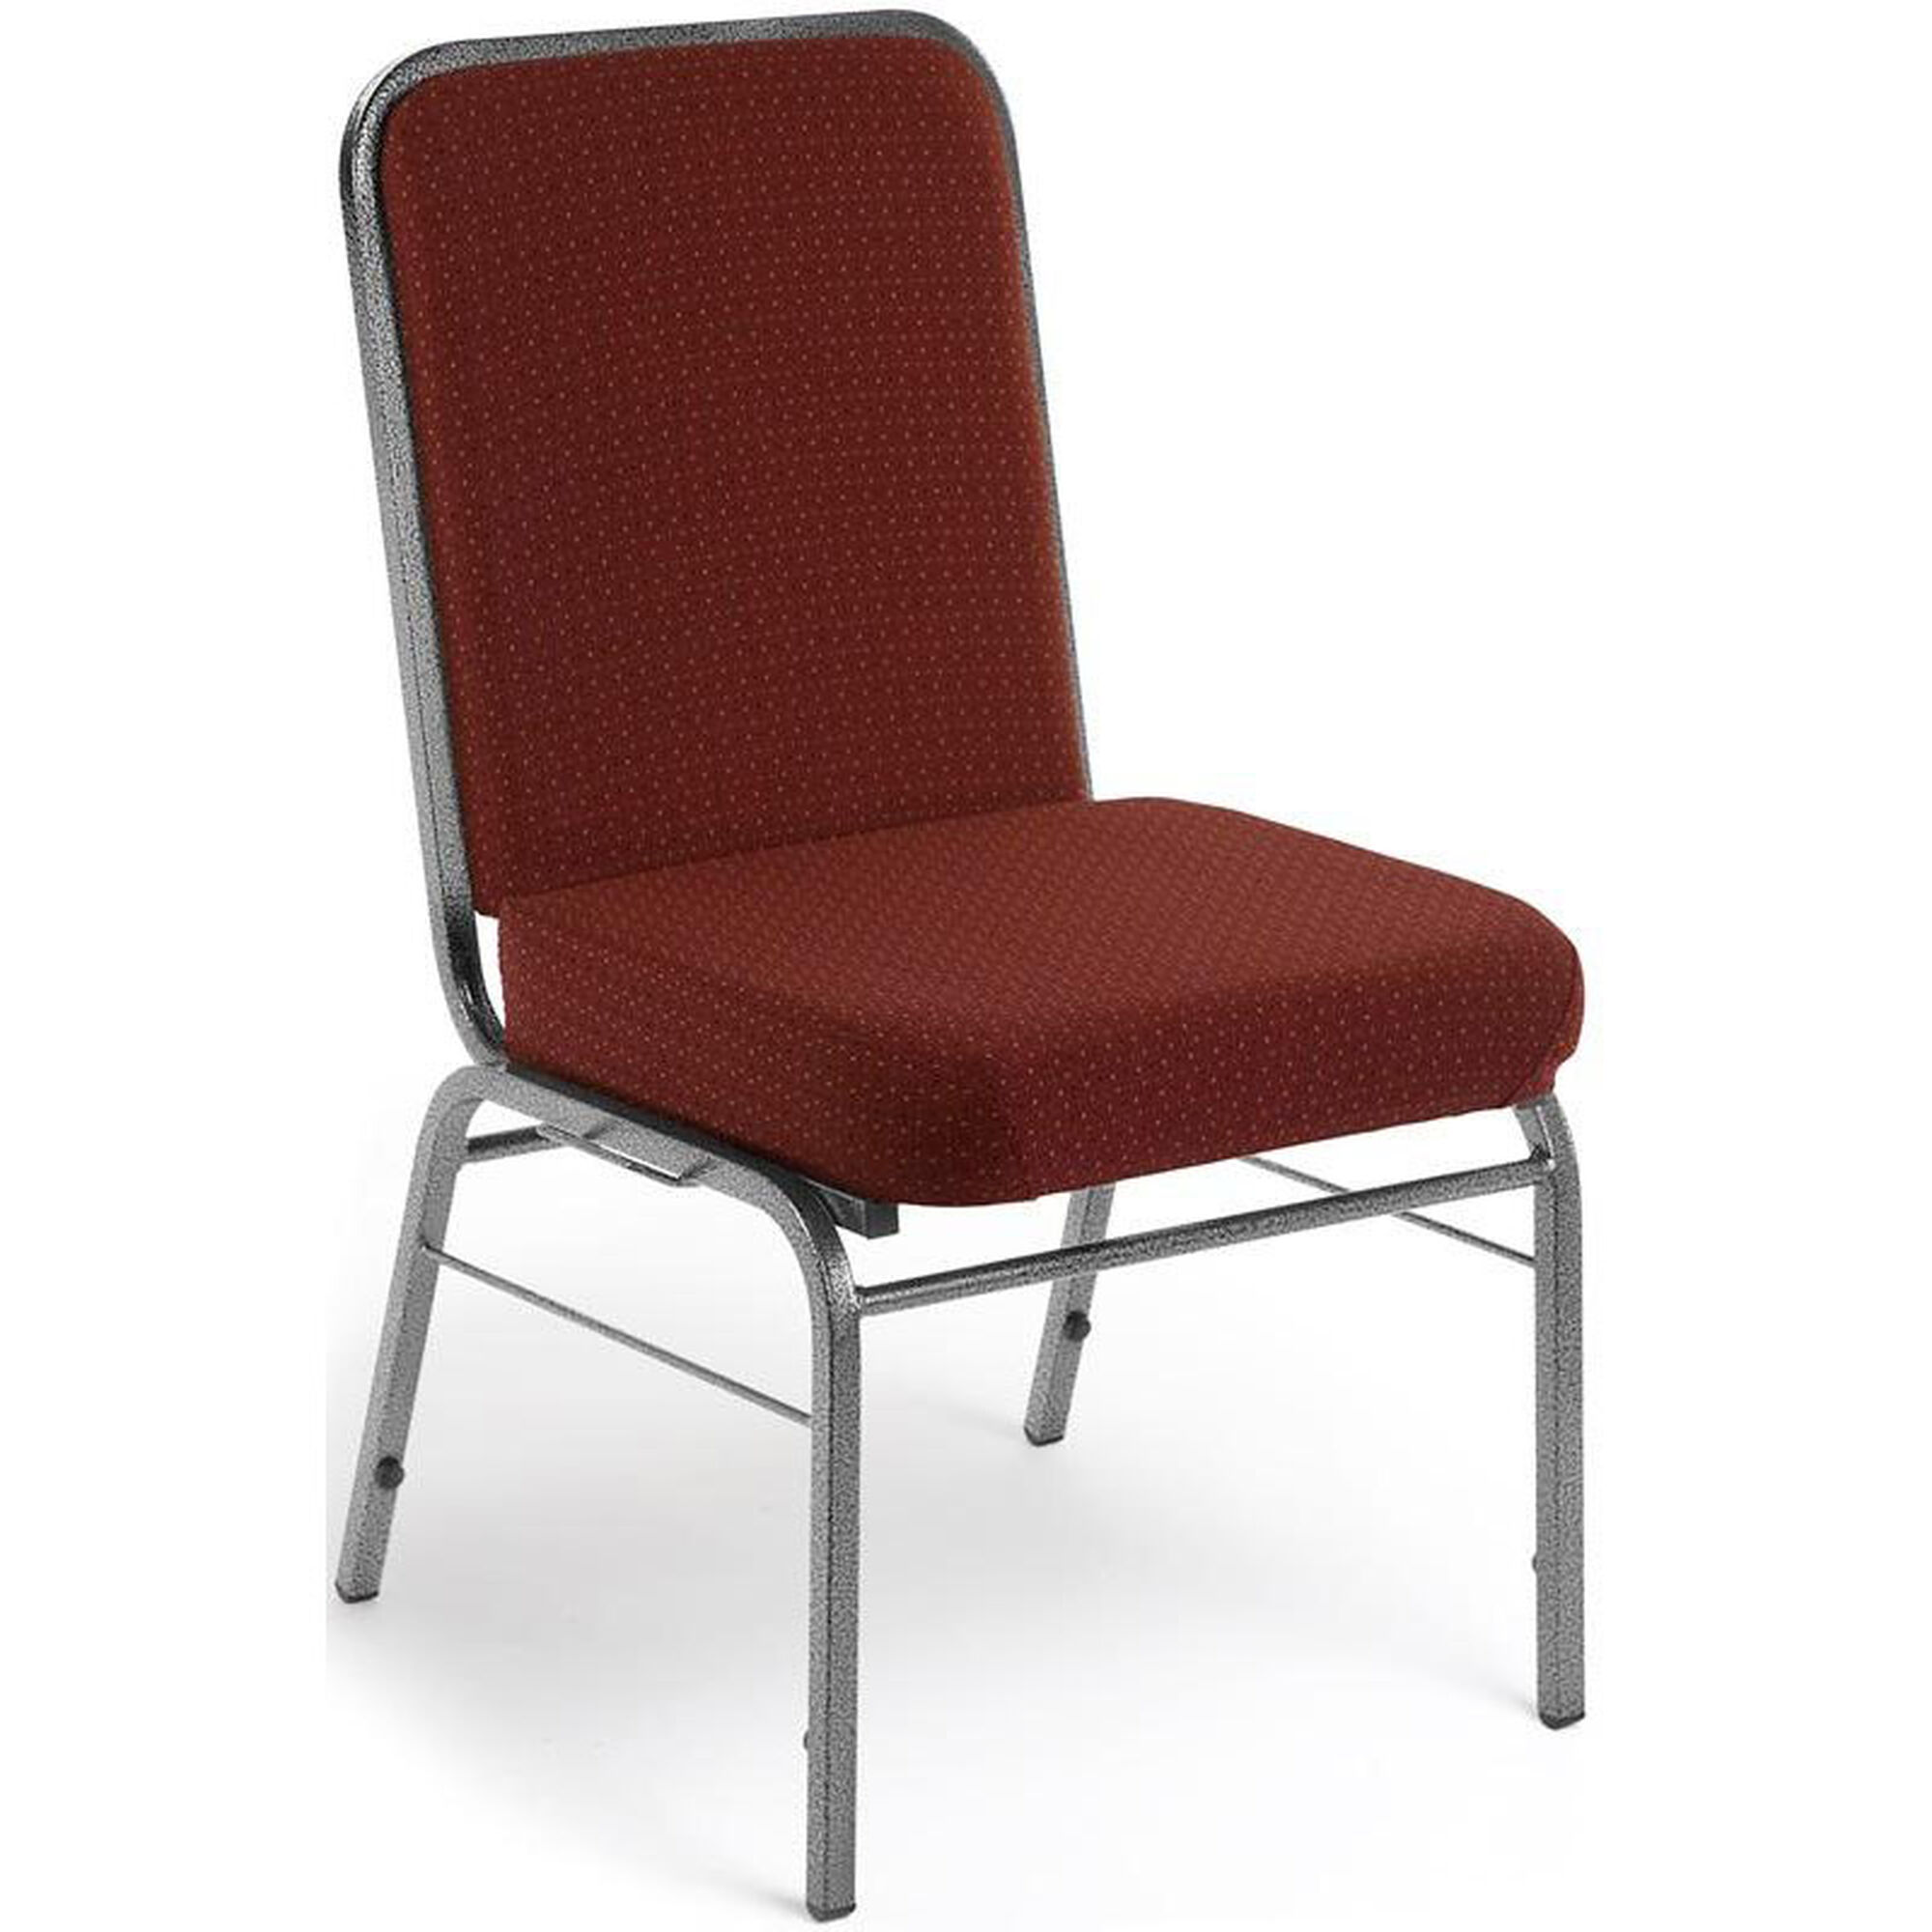 stack chair pinpoint burgundy 300 sv 3165. Black Bedroom Furniture Sets. Home Design Ideas